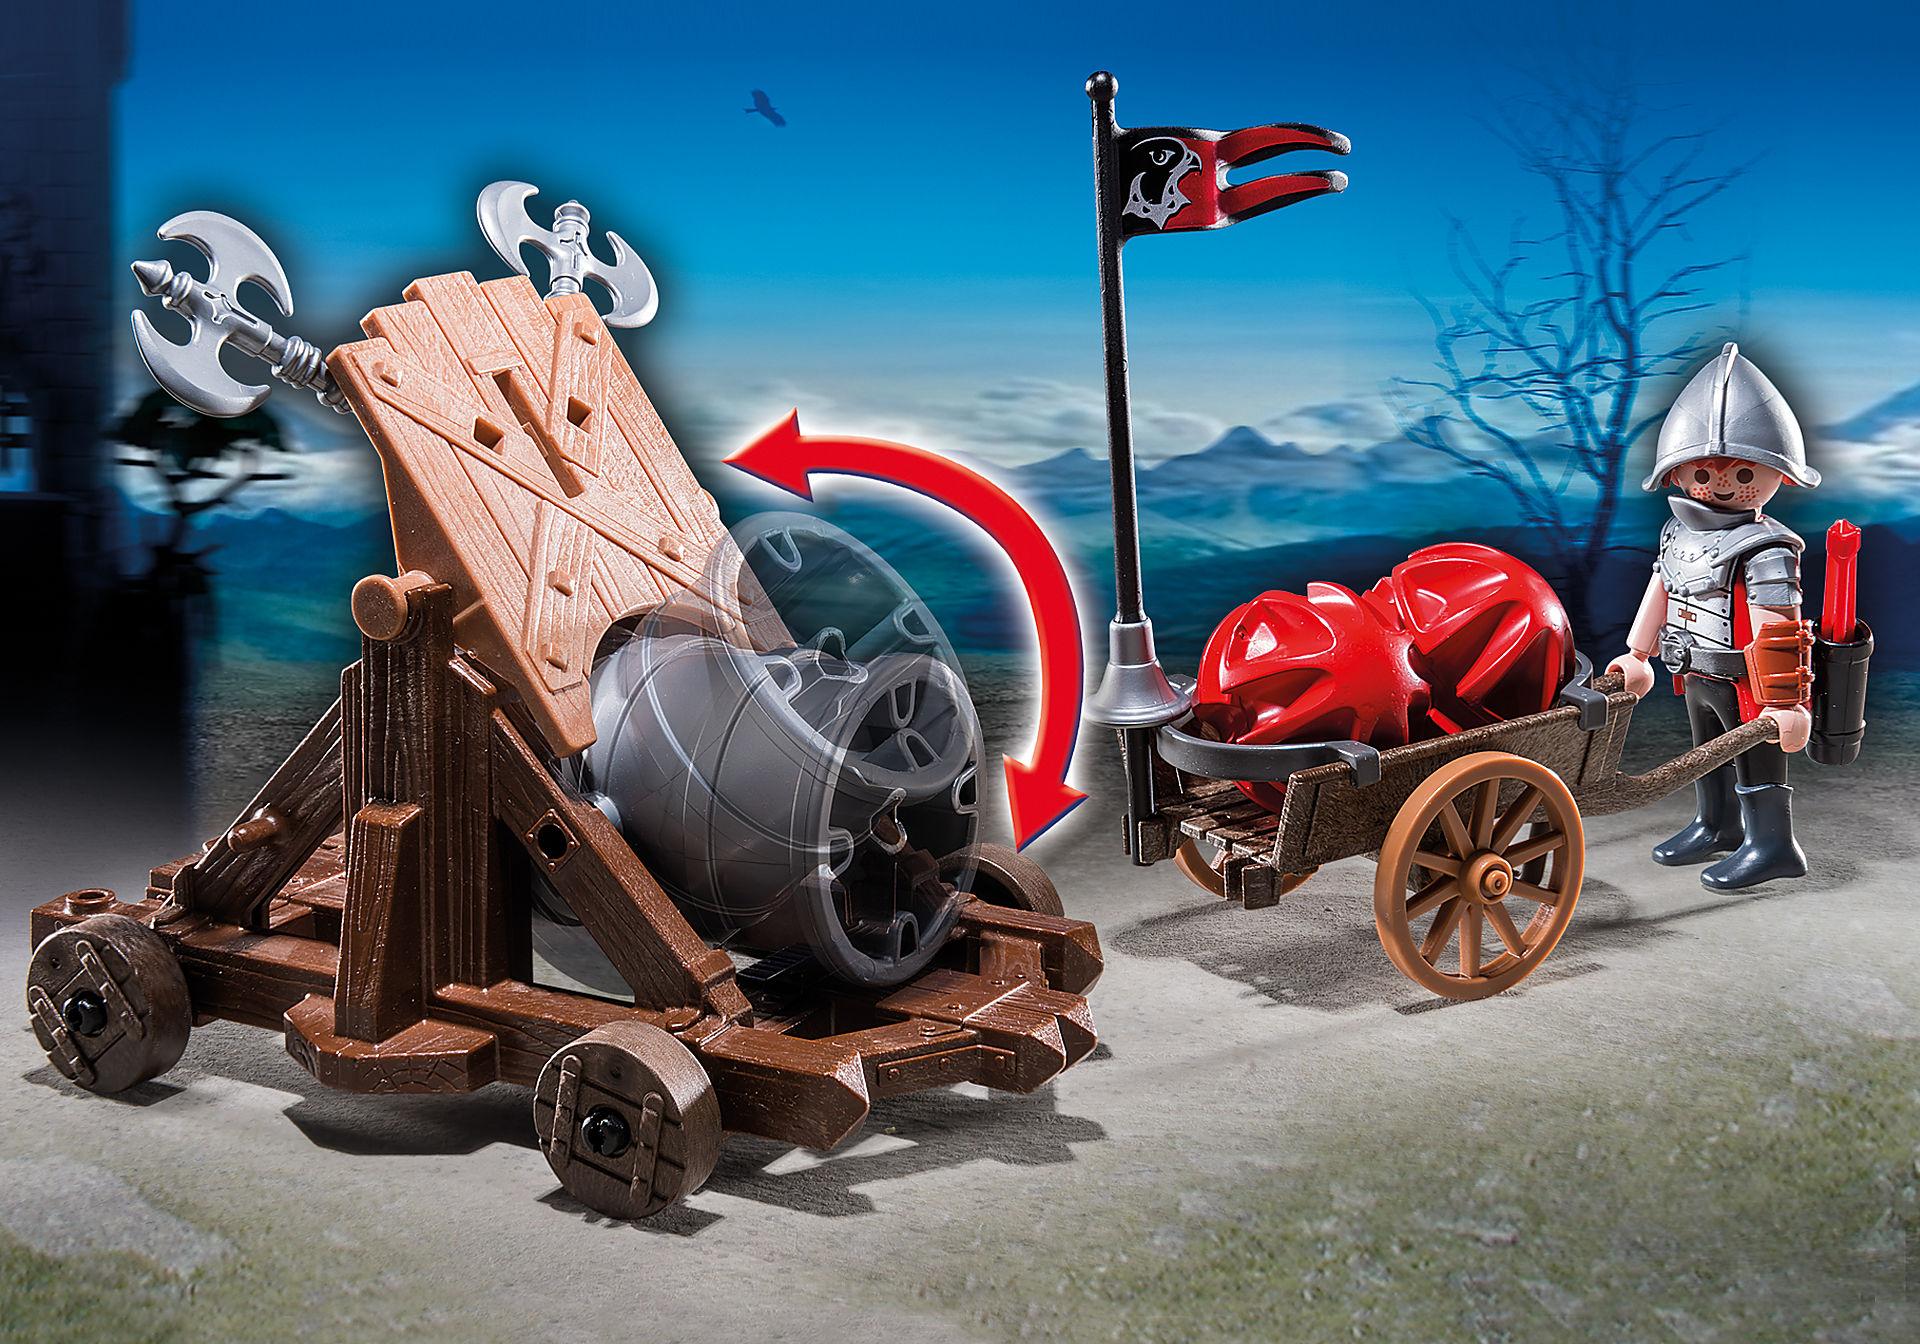 http://media.playmobil.com/i/playmobil/6038_product_extra1/Рыцари: Боевая пушка Рыцарей Сокола